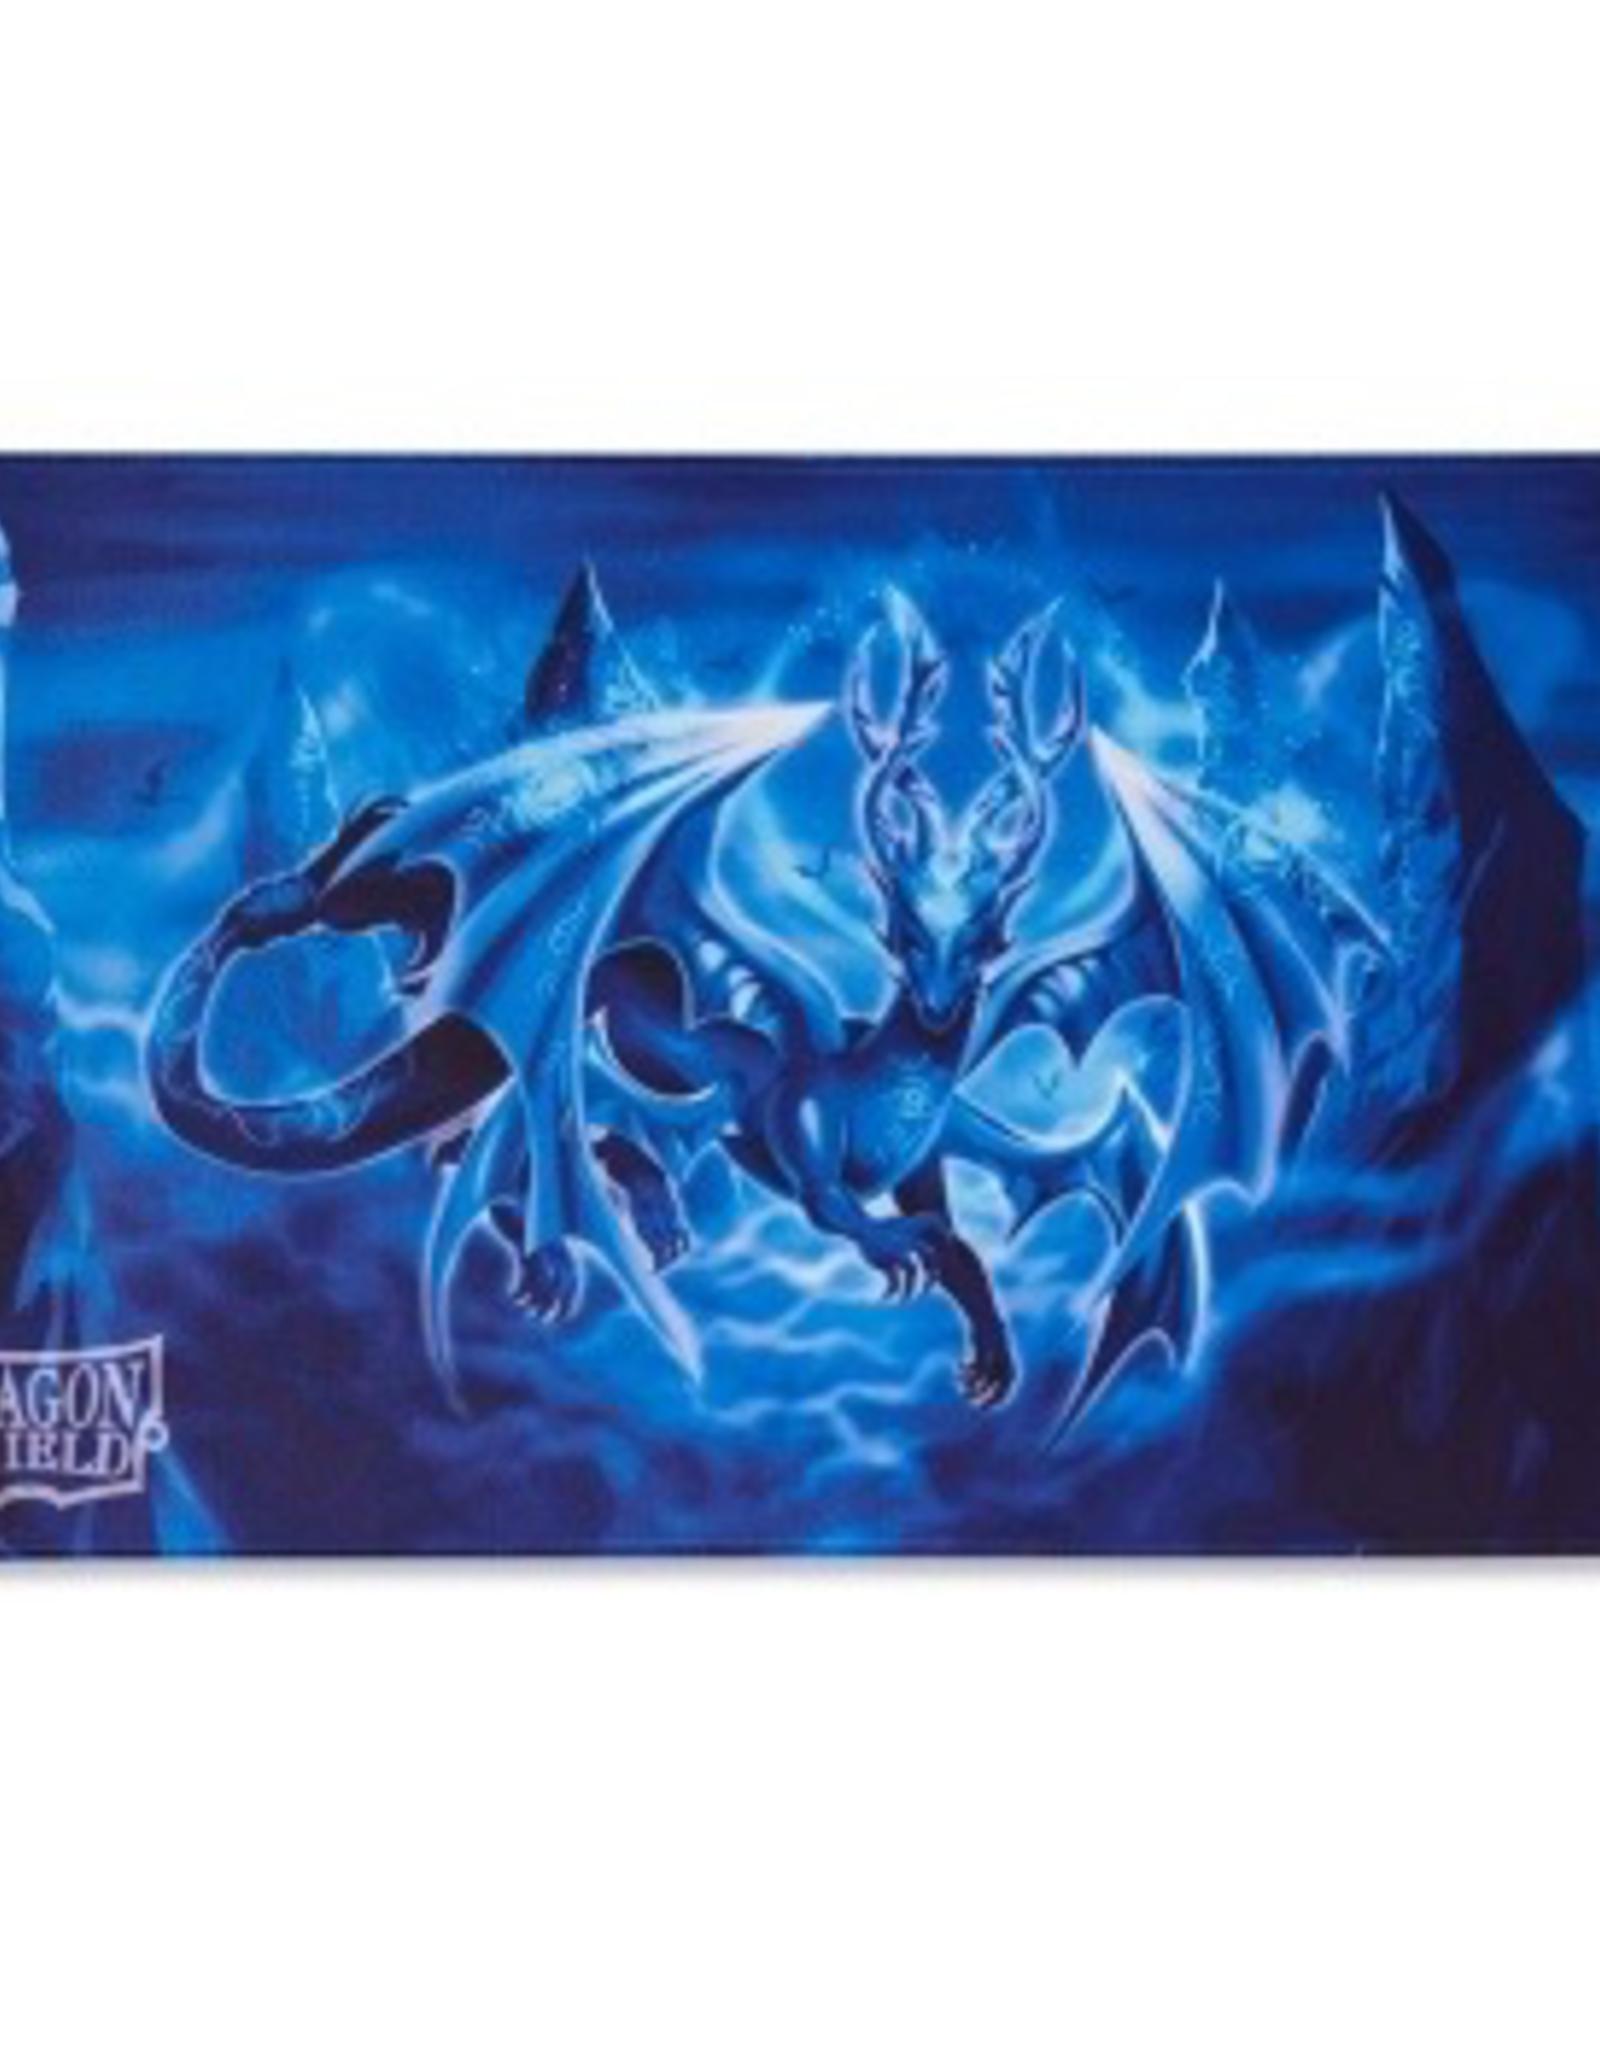 DS - Play Mat Dragon Shield Play Mat - Xon